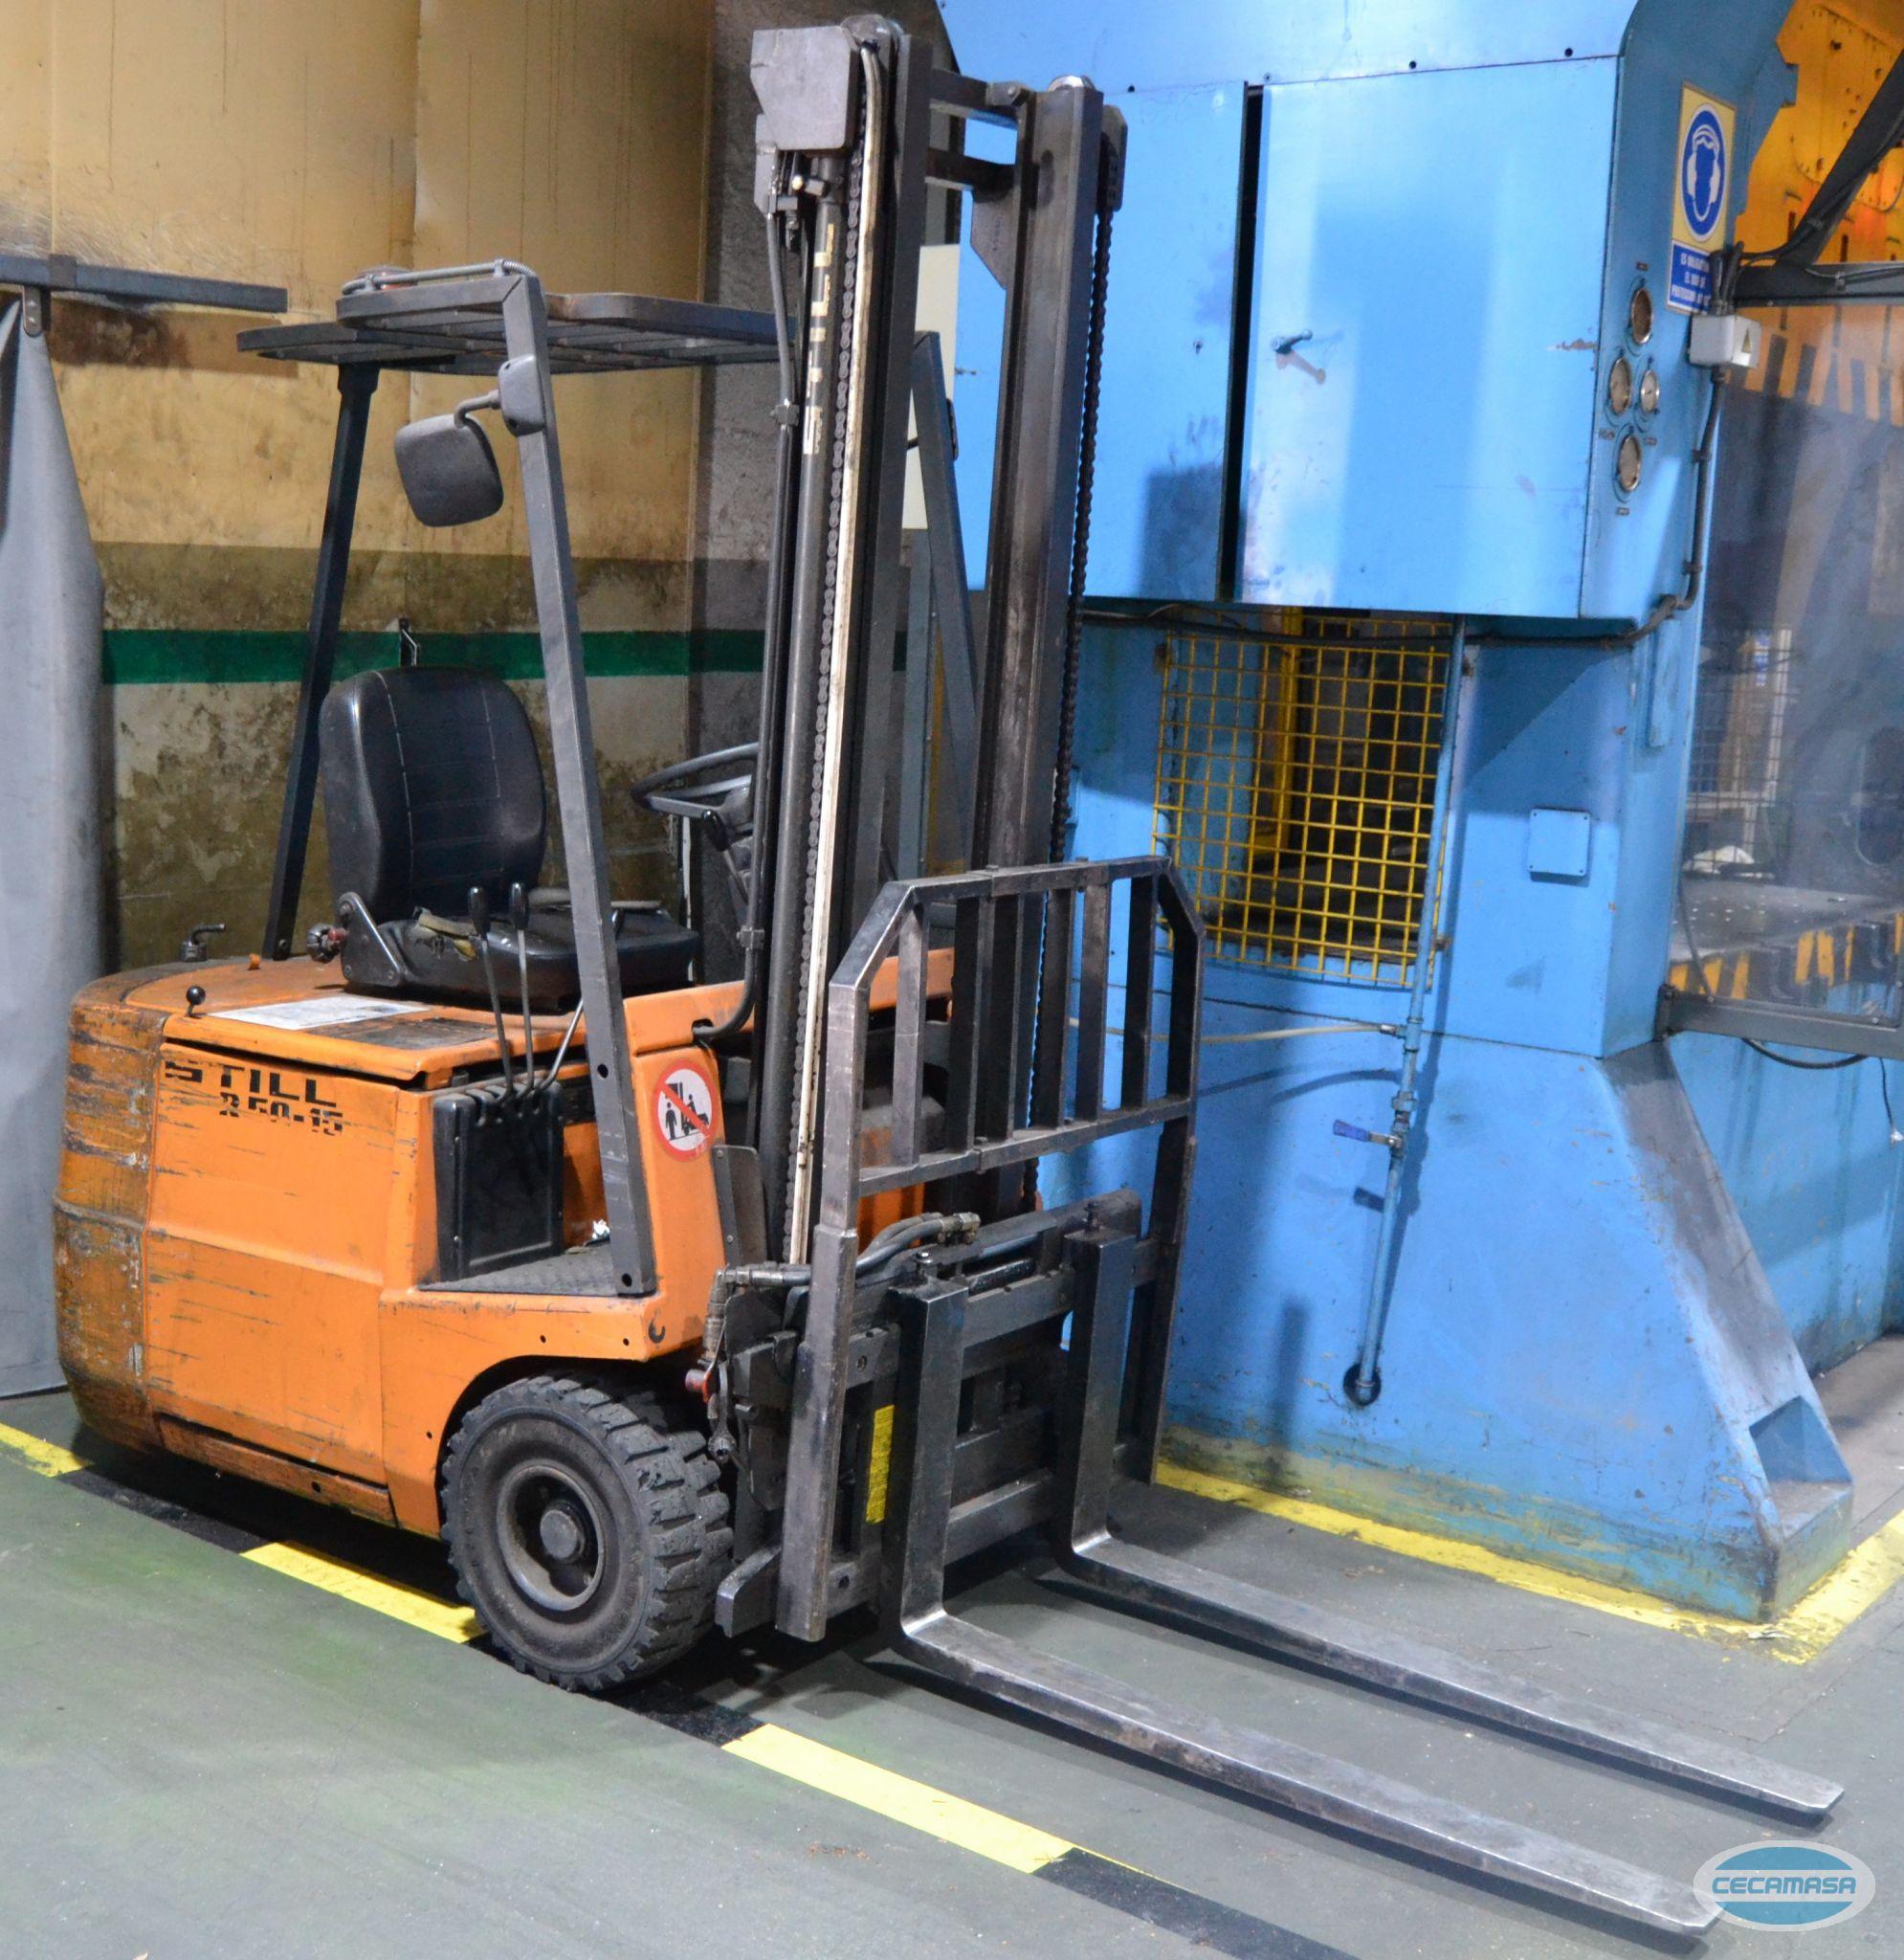 Electric forklift STILL R50-15